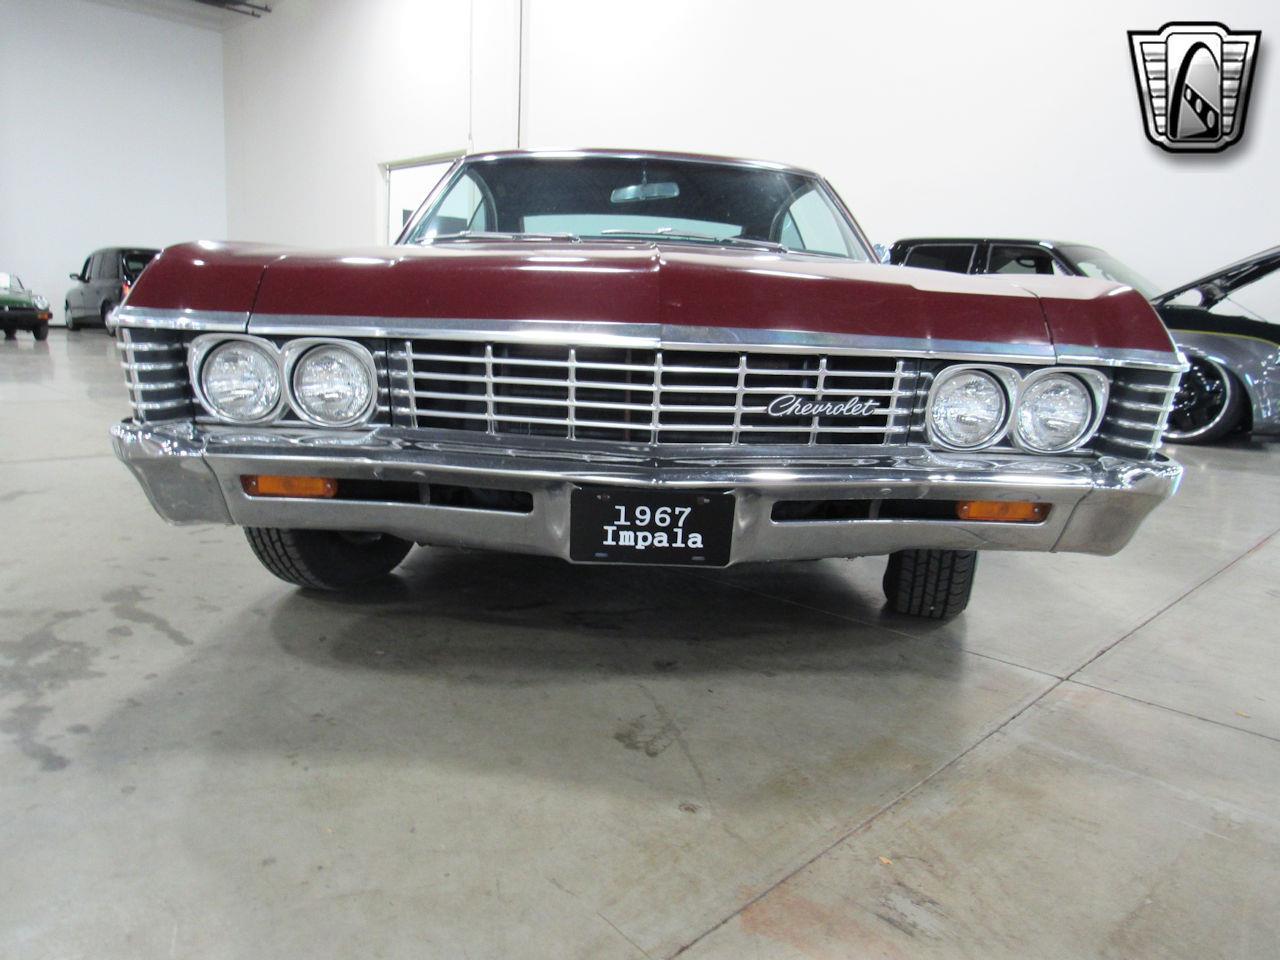 1967 Chevrolet Impala (CC-1361695) for sale in O'Fallon, Illinois